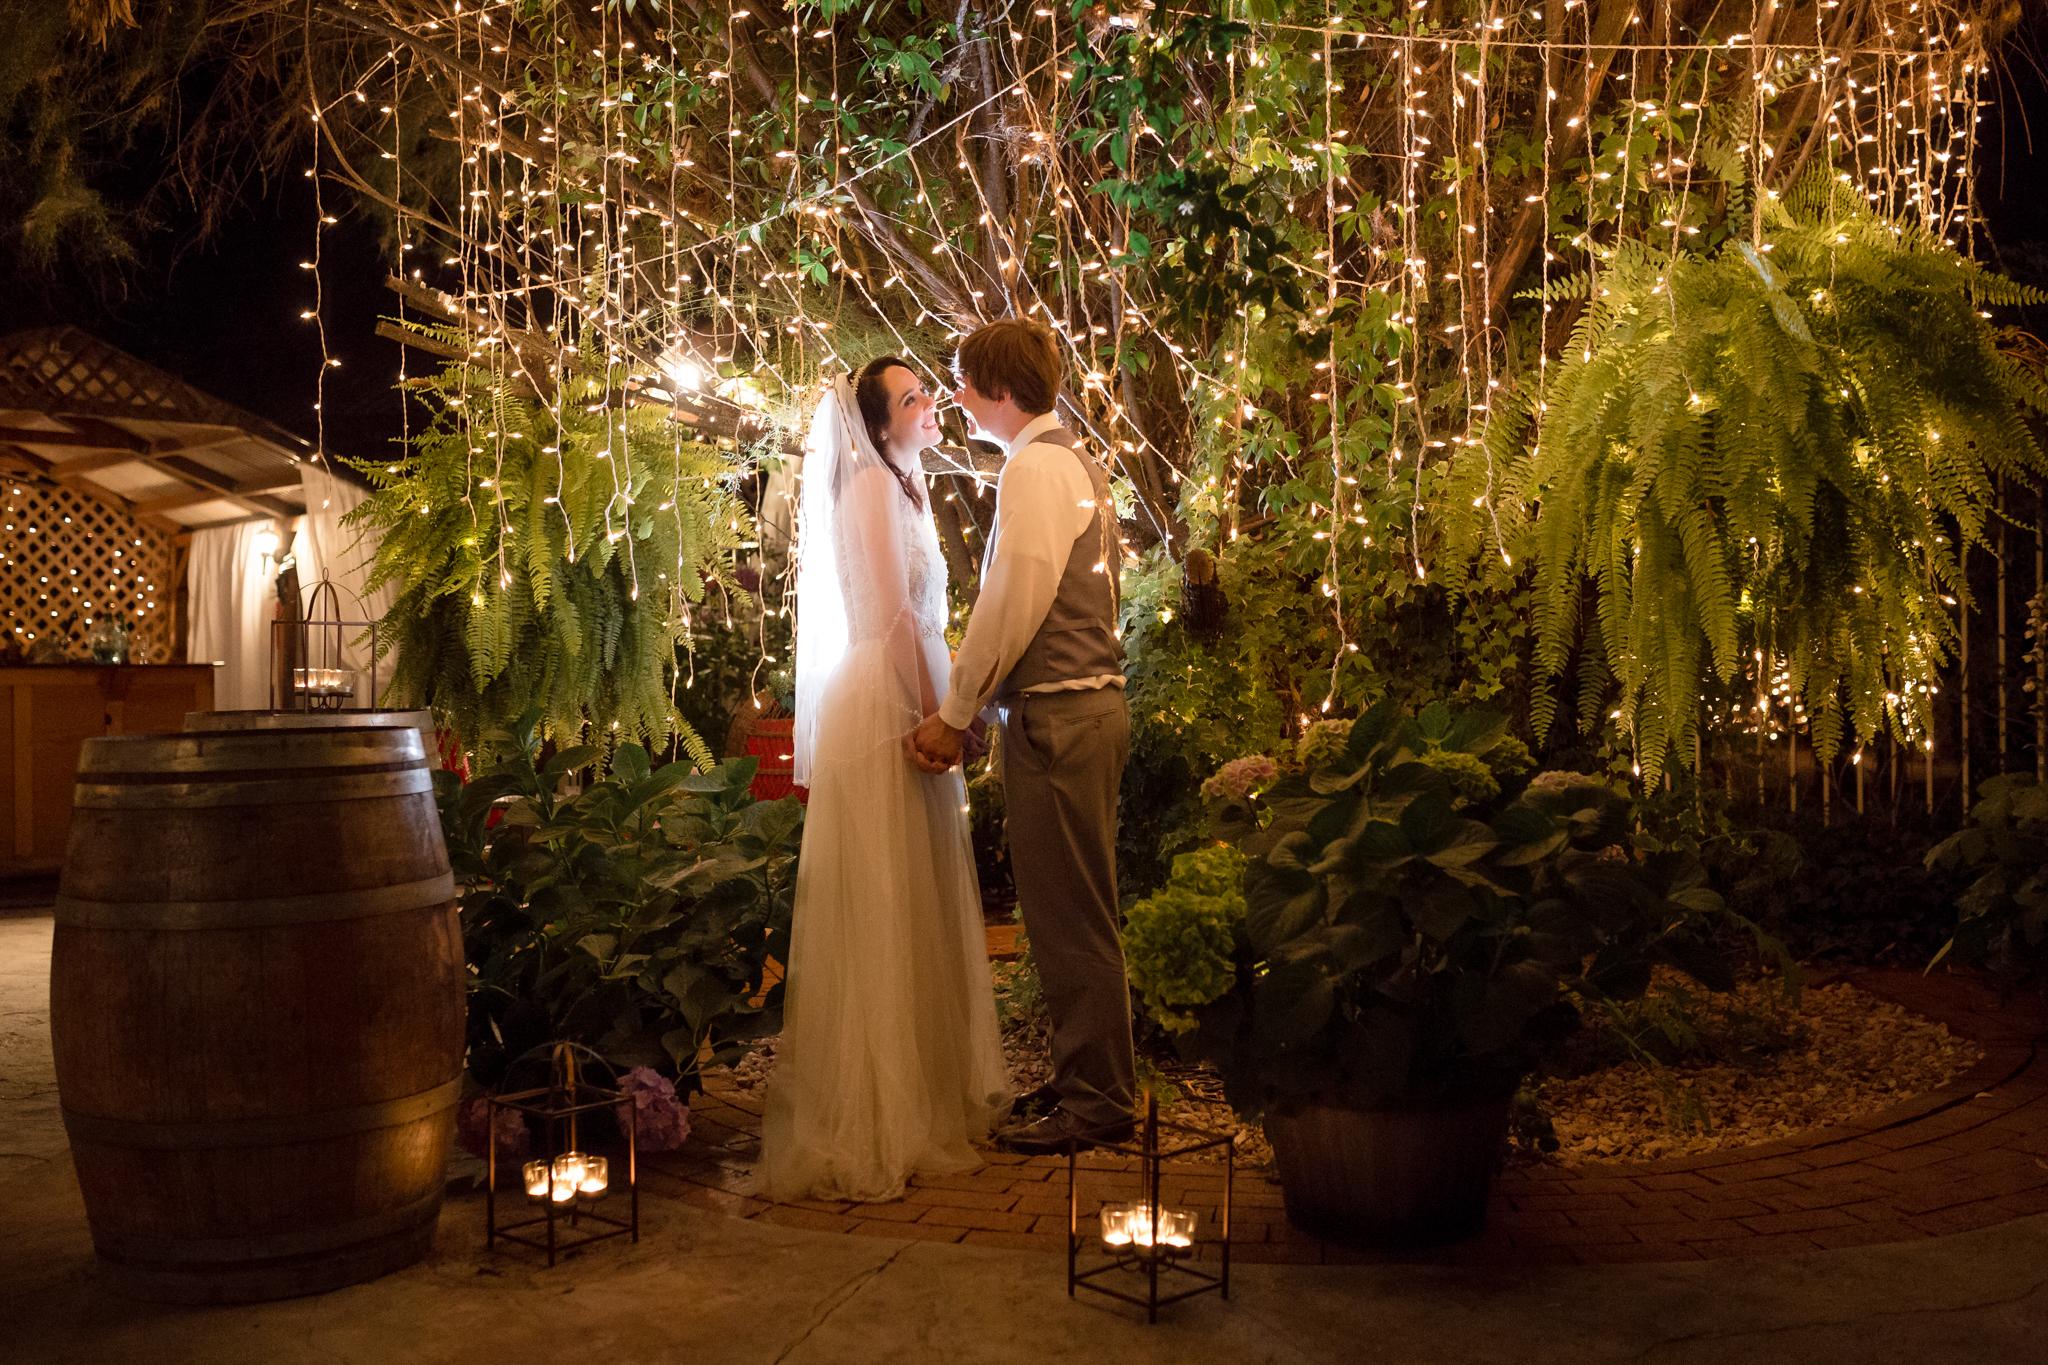 Heirloom-Inn-Garden-Wedding-Photography-Ione-88.jpg